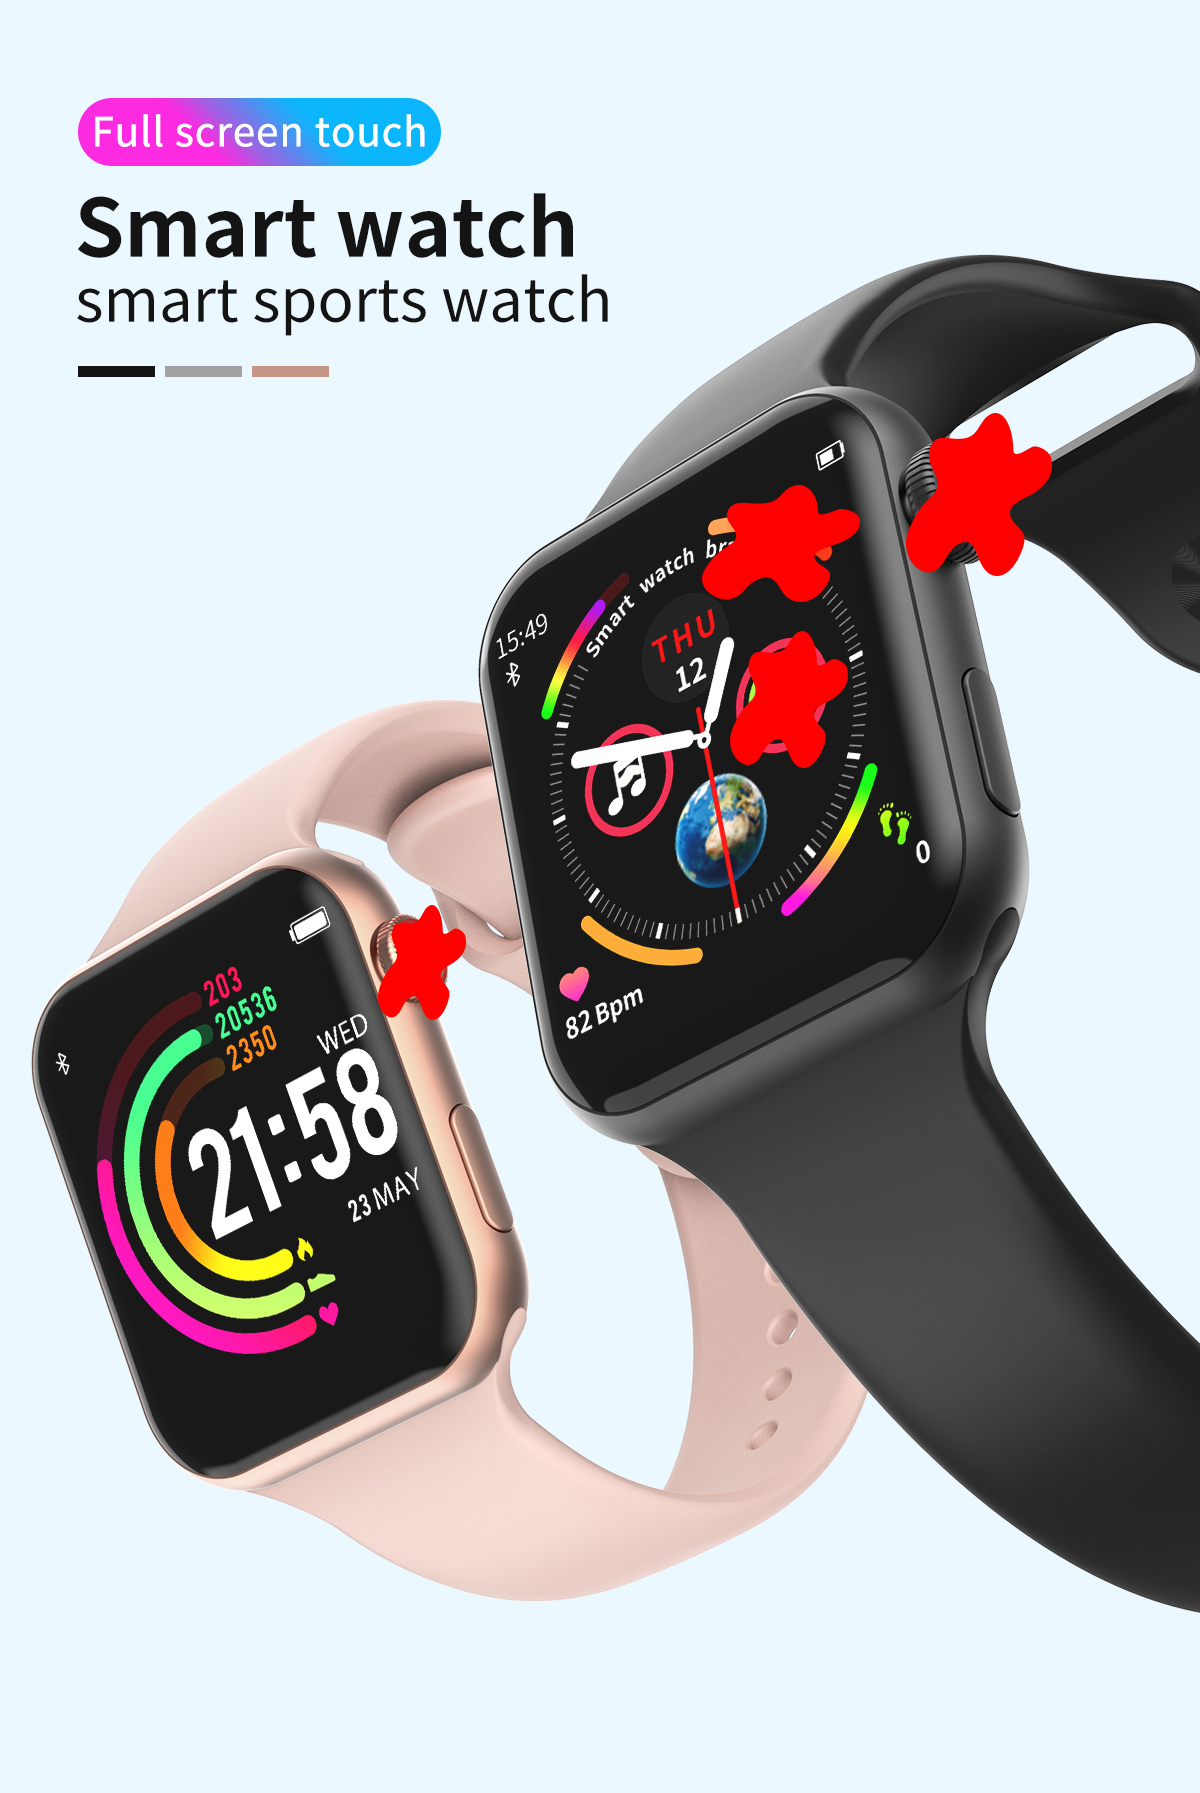 H25d8c2551cdb4115bb924731789e5af7V 696 New Style F10 Smart Watch Full touch screen Bluetooth Smartwatch Music Camera Heart Rate Monitor Waterproof Smart Bracelet